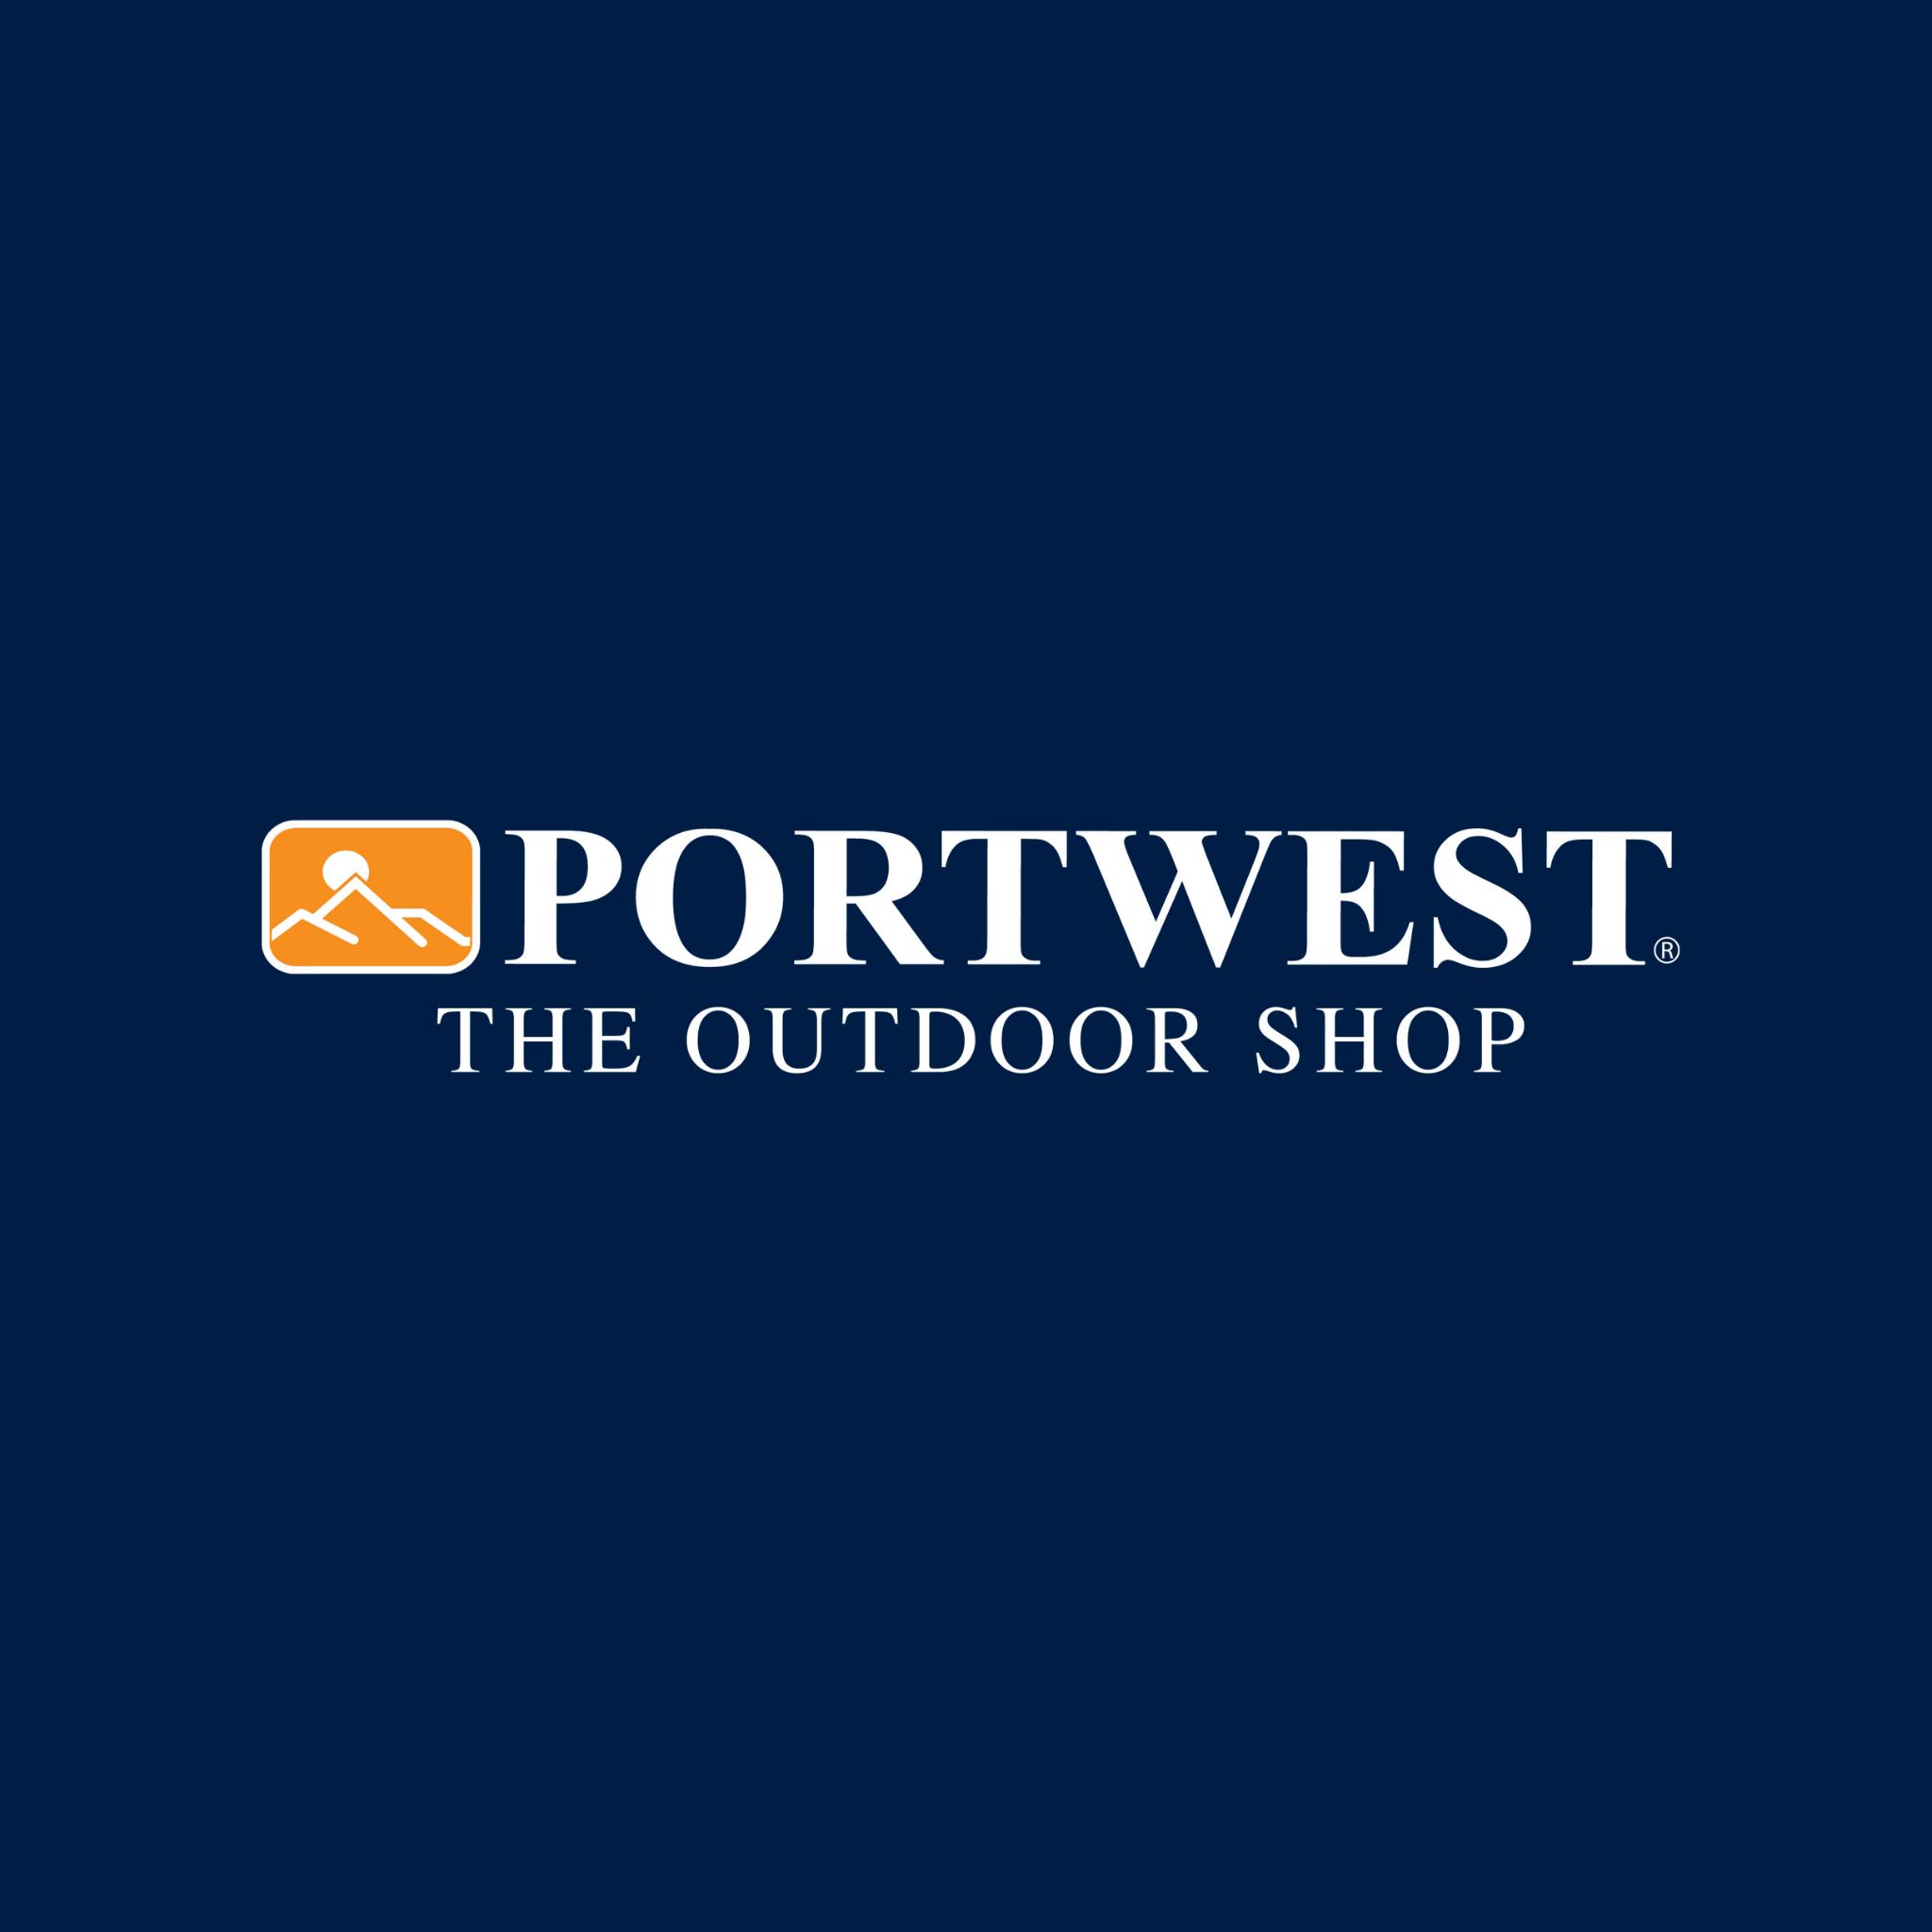 Portwest Ireland - The Factory Shop